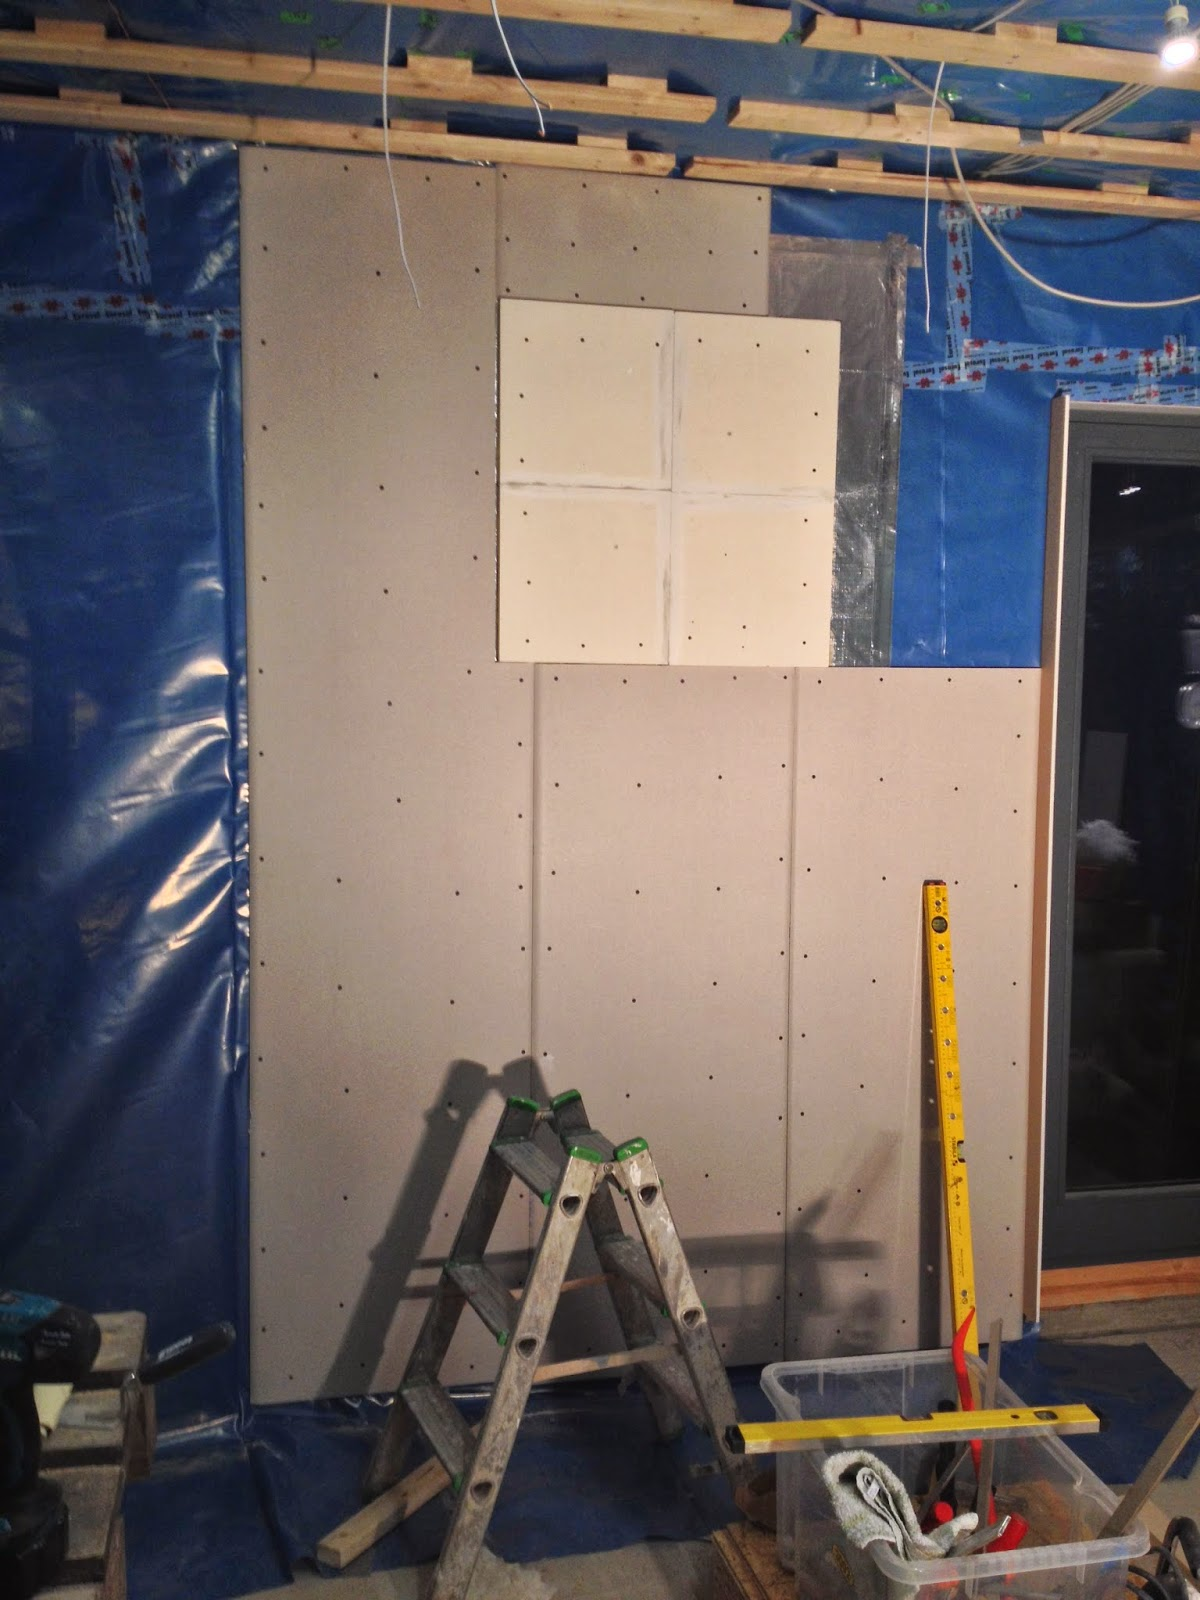 bautagebuch hassenroth keller tetris. Black Bedroom Furniture Sets. Home Design Ideas